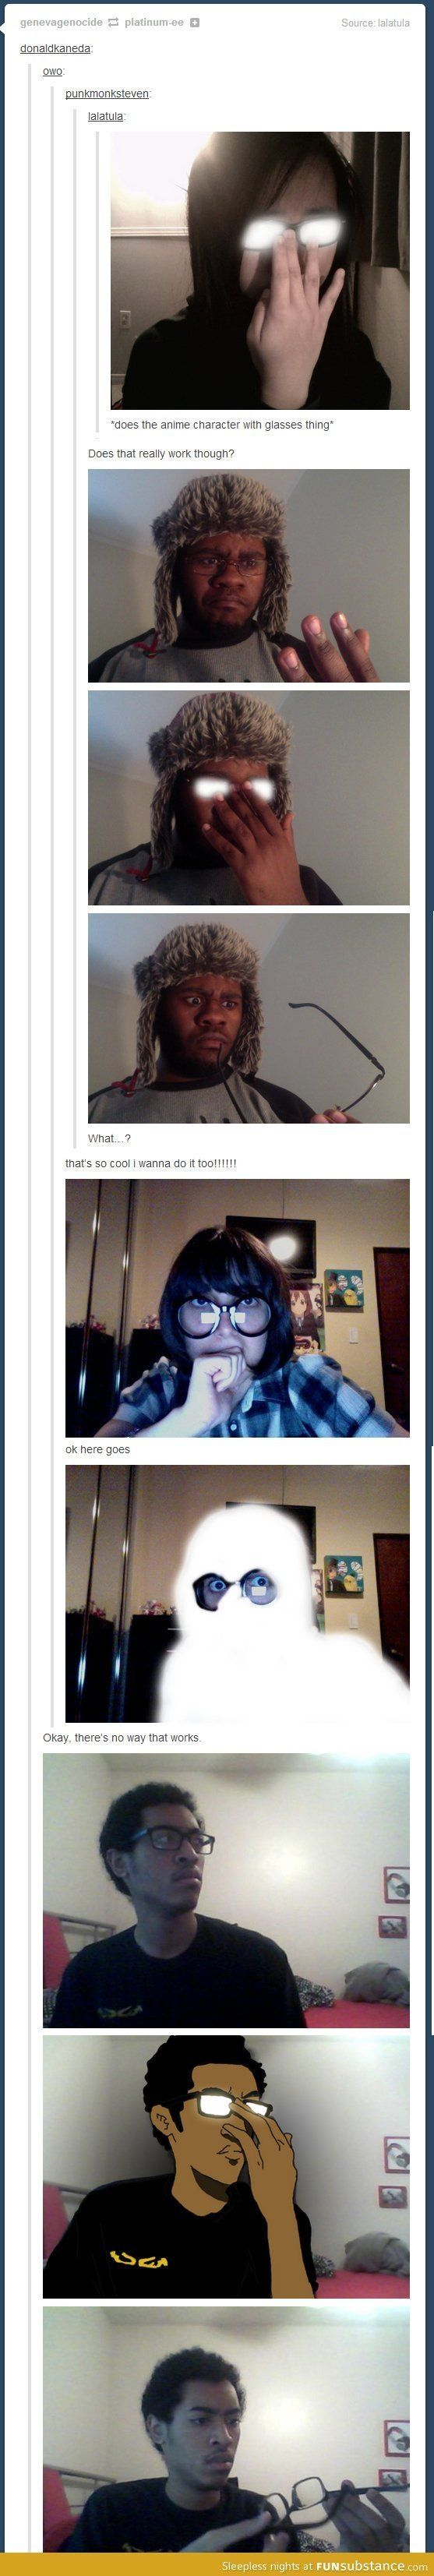 The otaku glasses thing